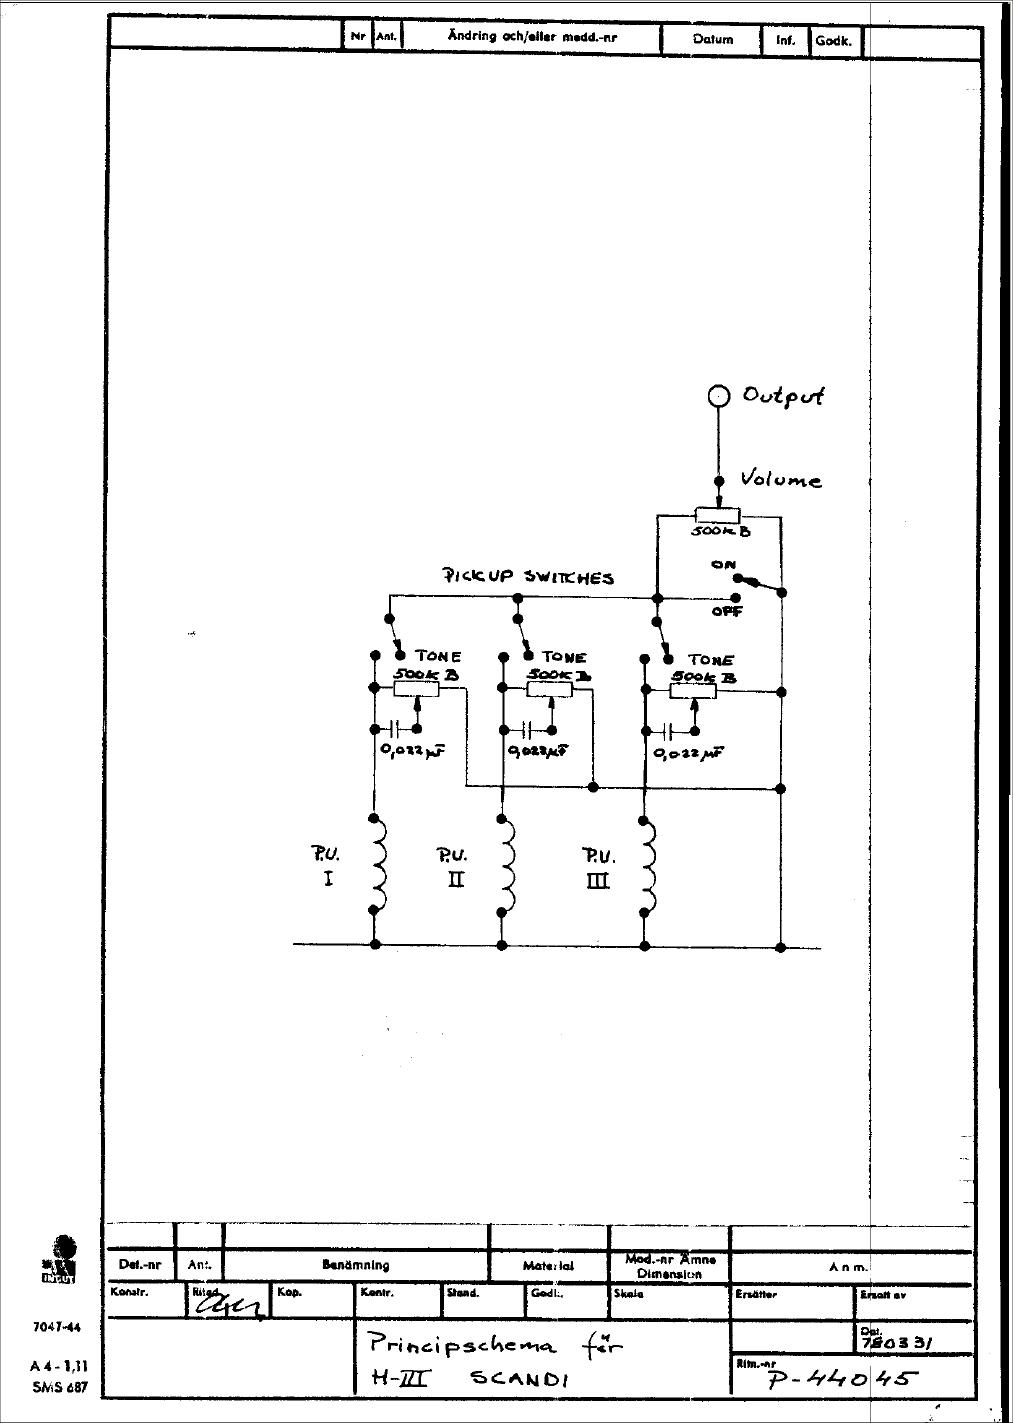 Hagstrom Guitar Wiring Diagram : Hagstrom guitar schematics get free image about